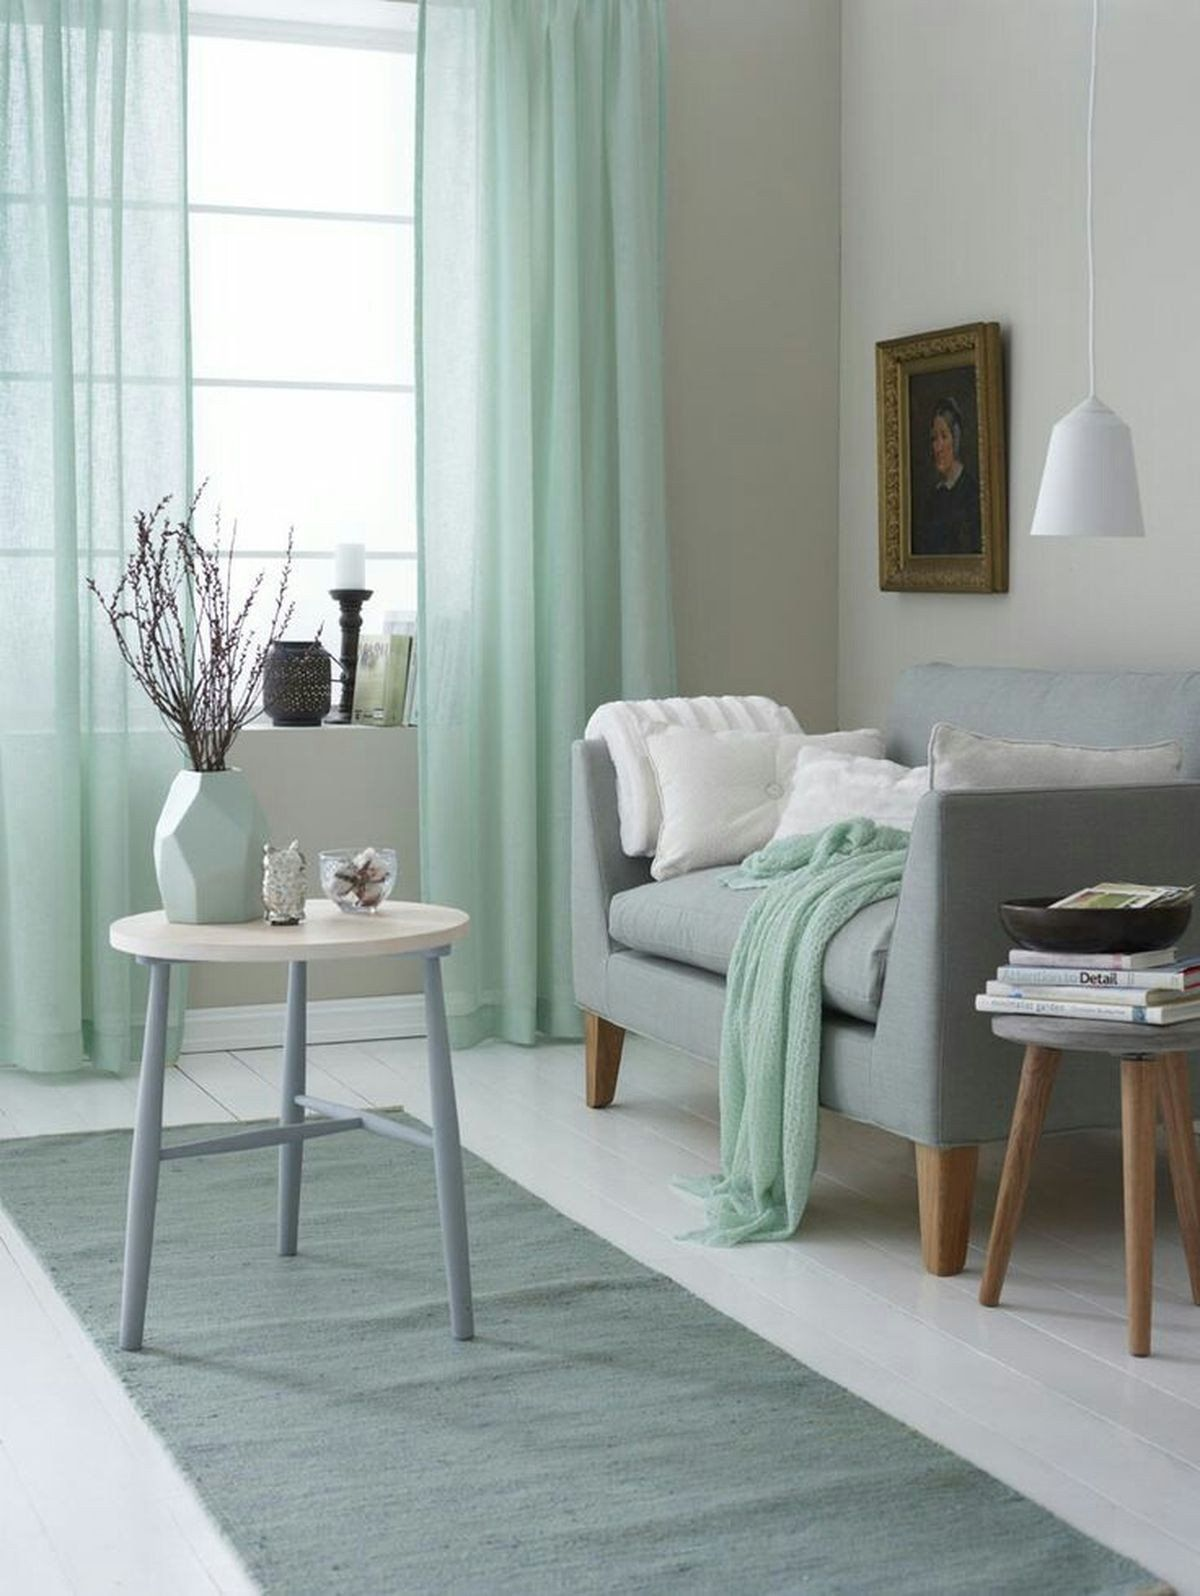 living room, white wooden floor, grey rug, green curtain, blue sofa, stools for table, white pendant